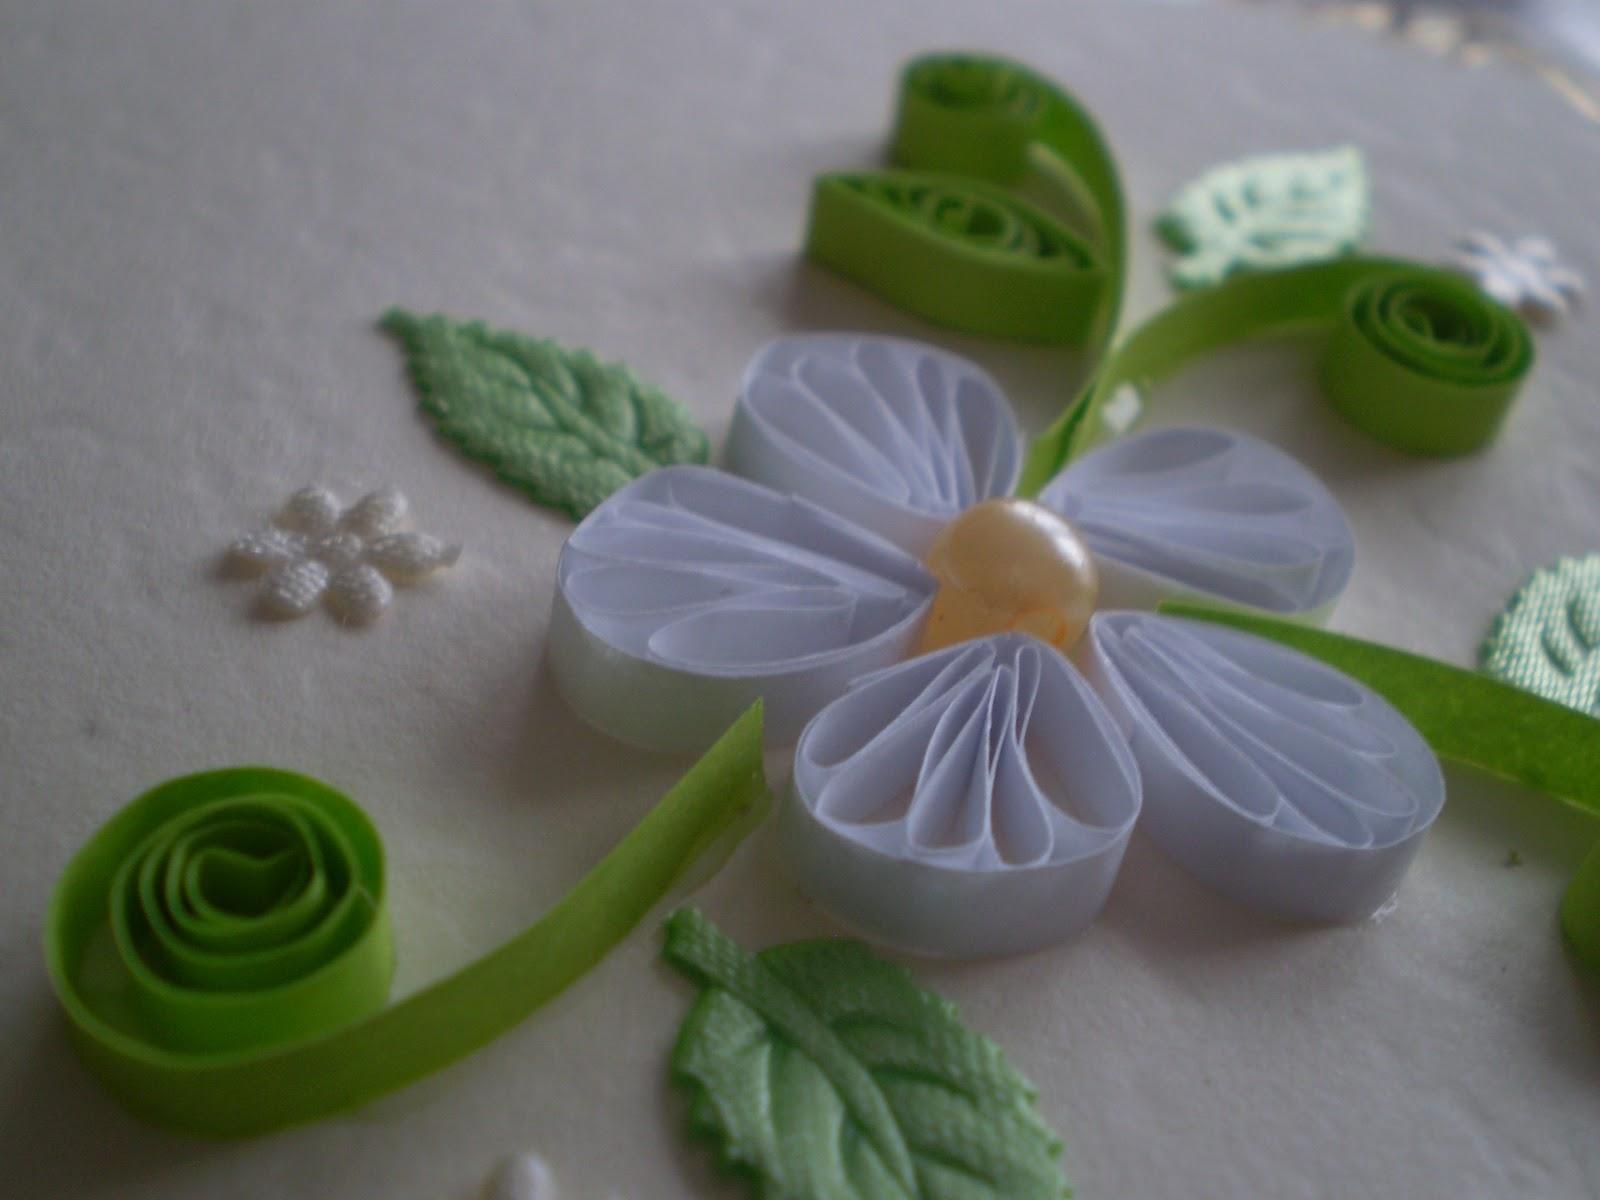 mariage fleur perle blanche arts crafts handmade artisanat rękodzieło zaproszenie invitation card carte kartka